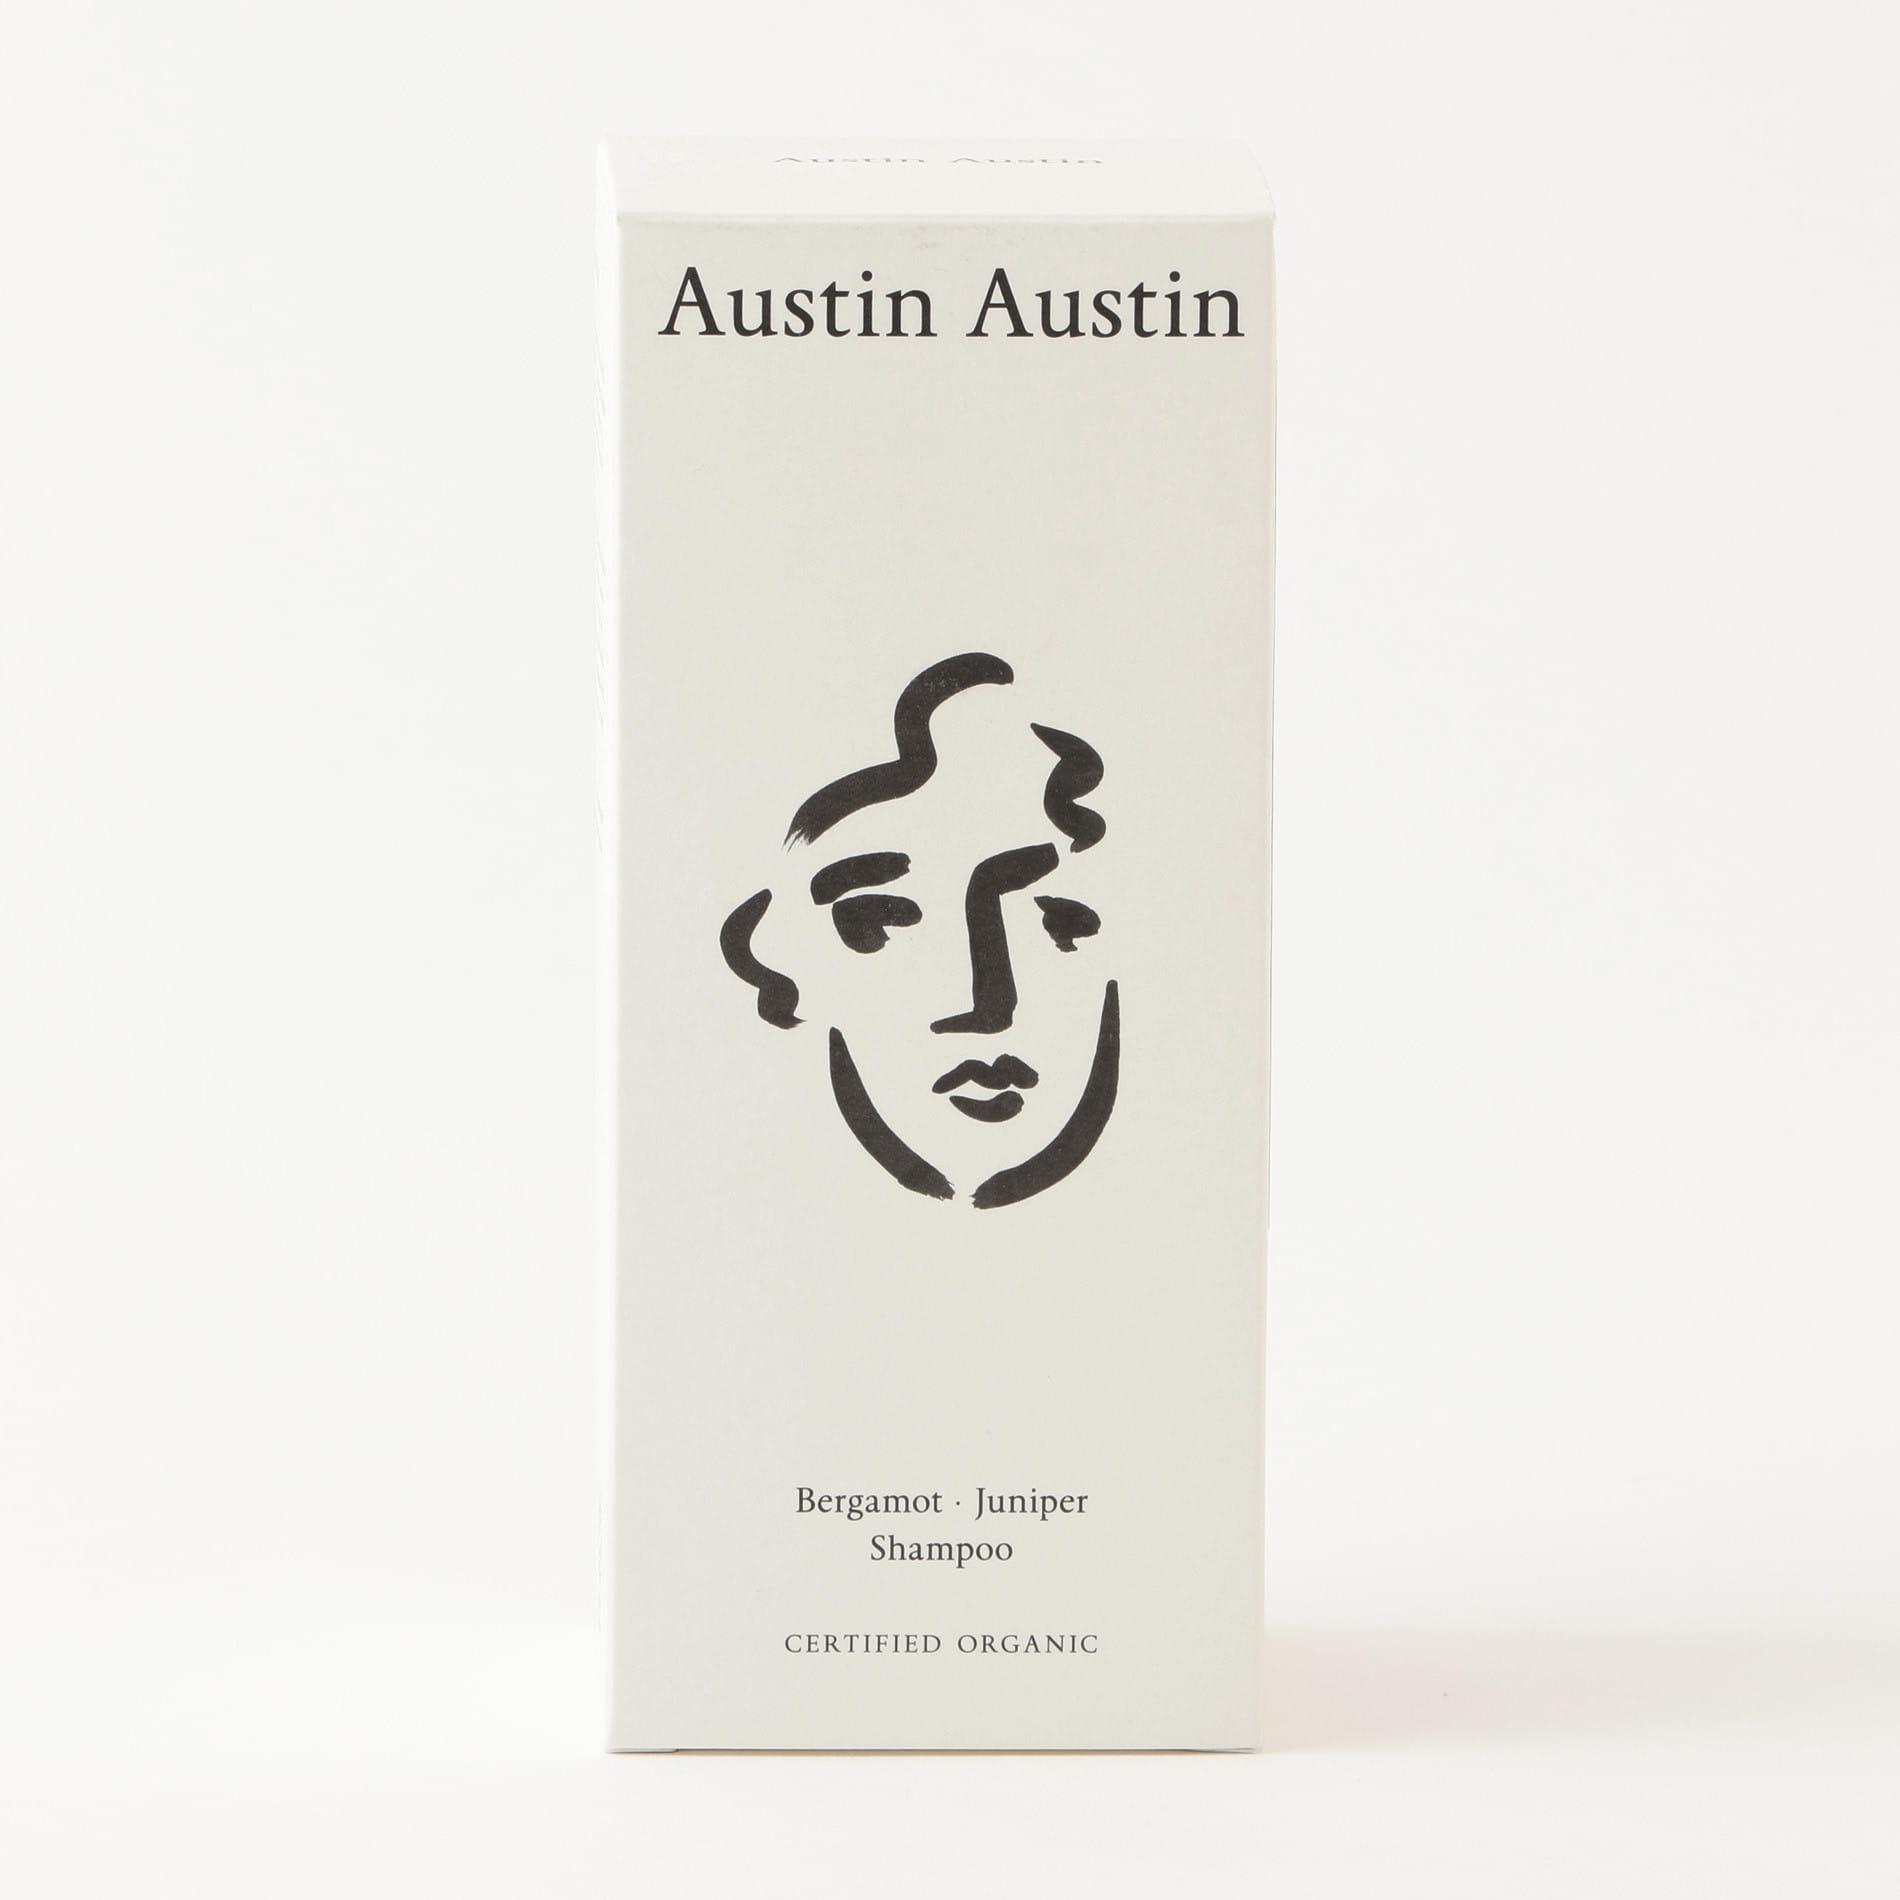 【Austin Austin】シャンプー MB03017A